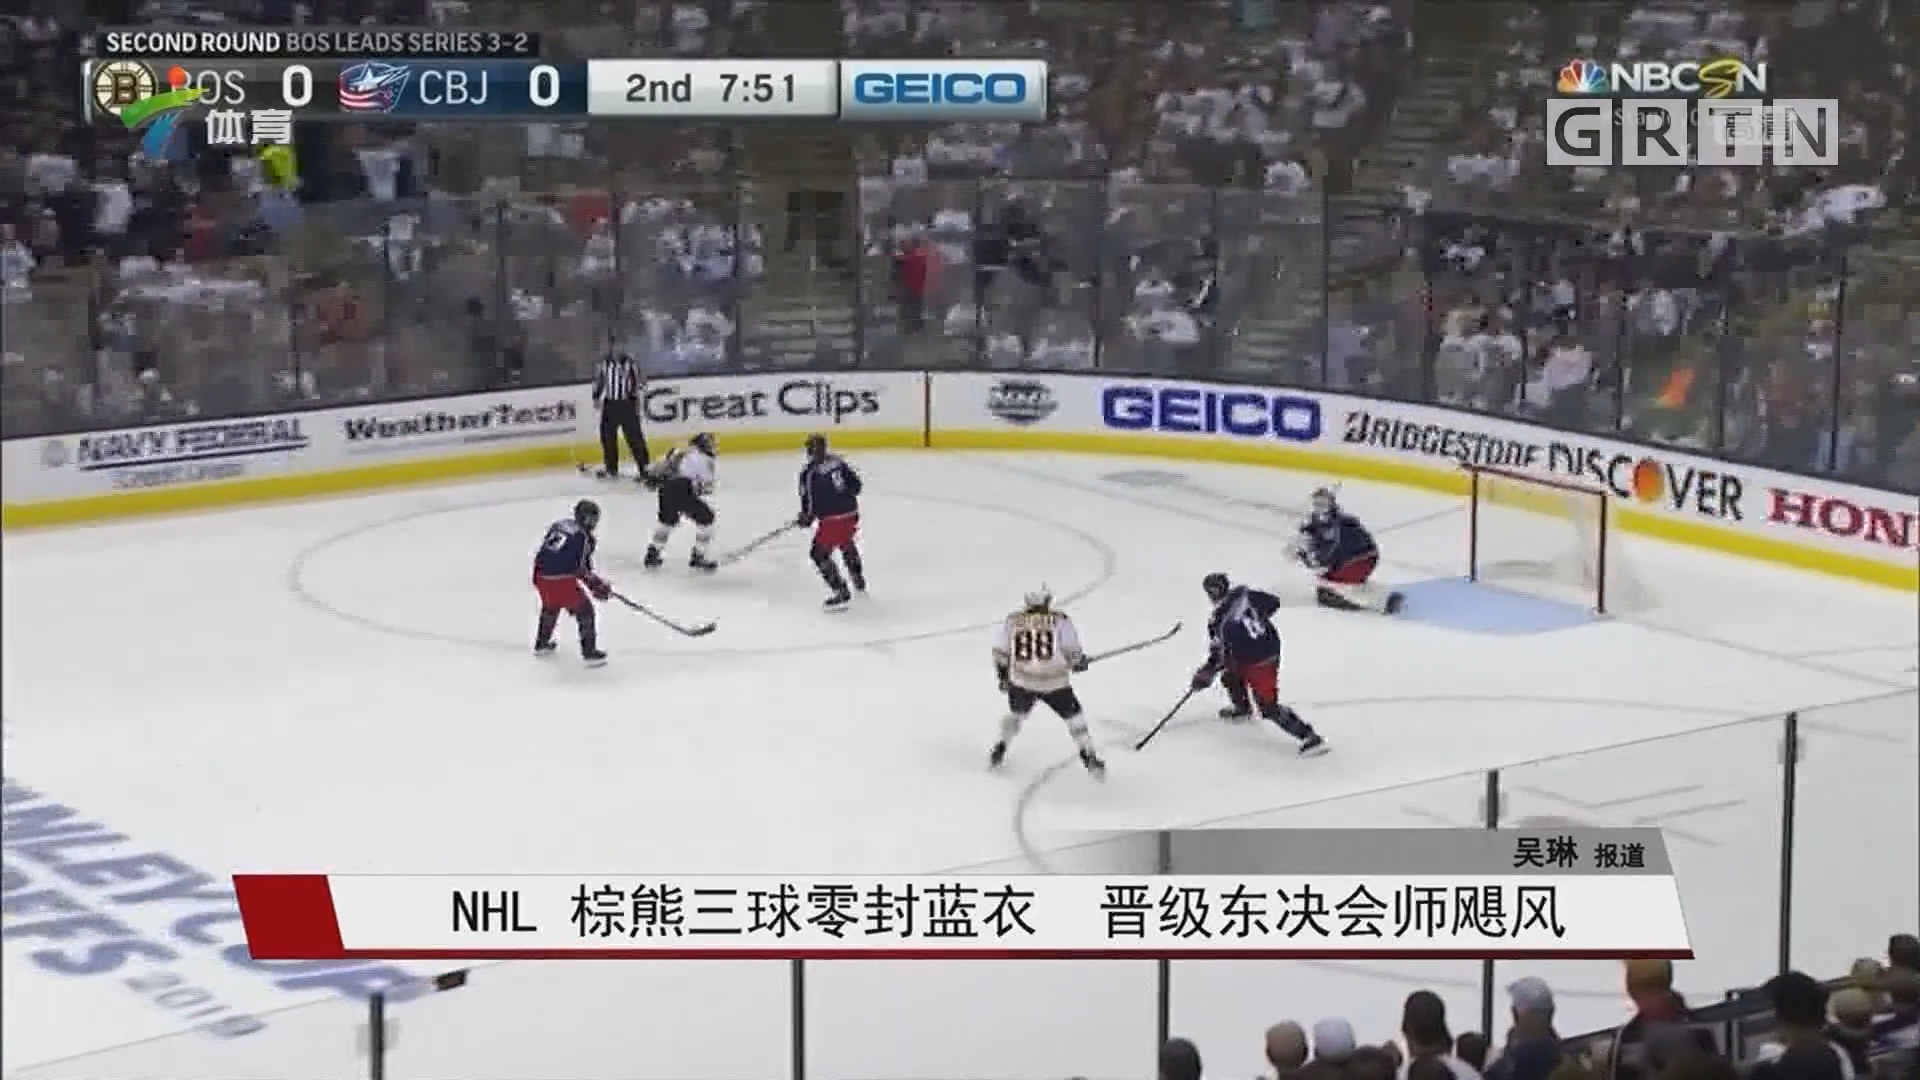 NHL 棕熊三球零封蓝衣 晋级东决会师飓风